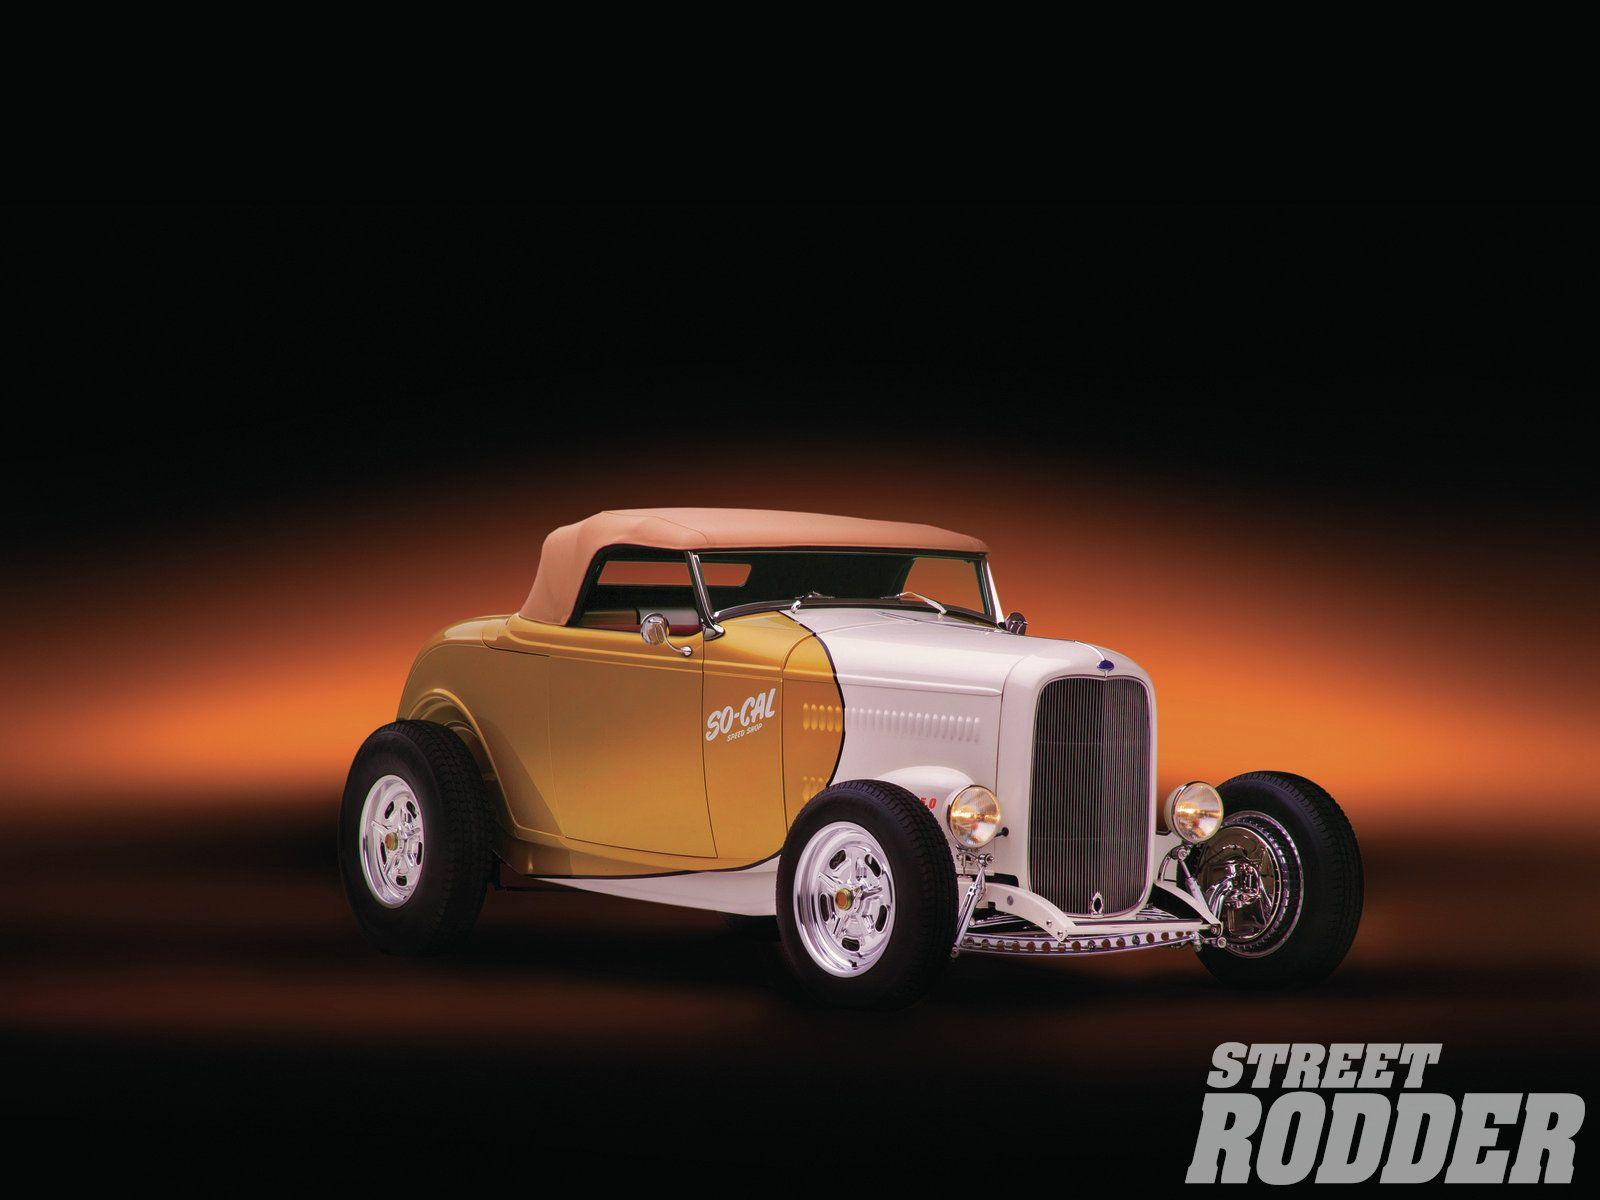 1932 Ford Highboy Roadster Retro Hot Rod Retro Hot Rod Street Rodder Roadsters